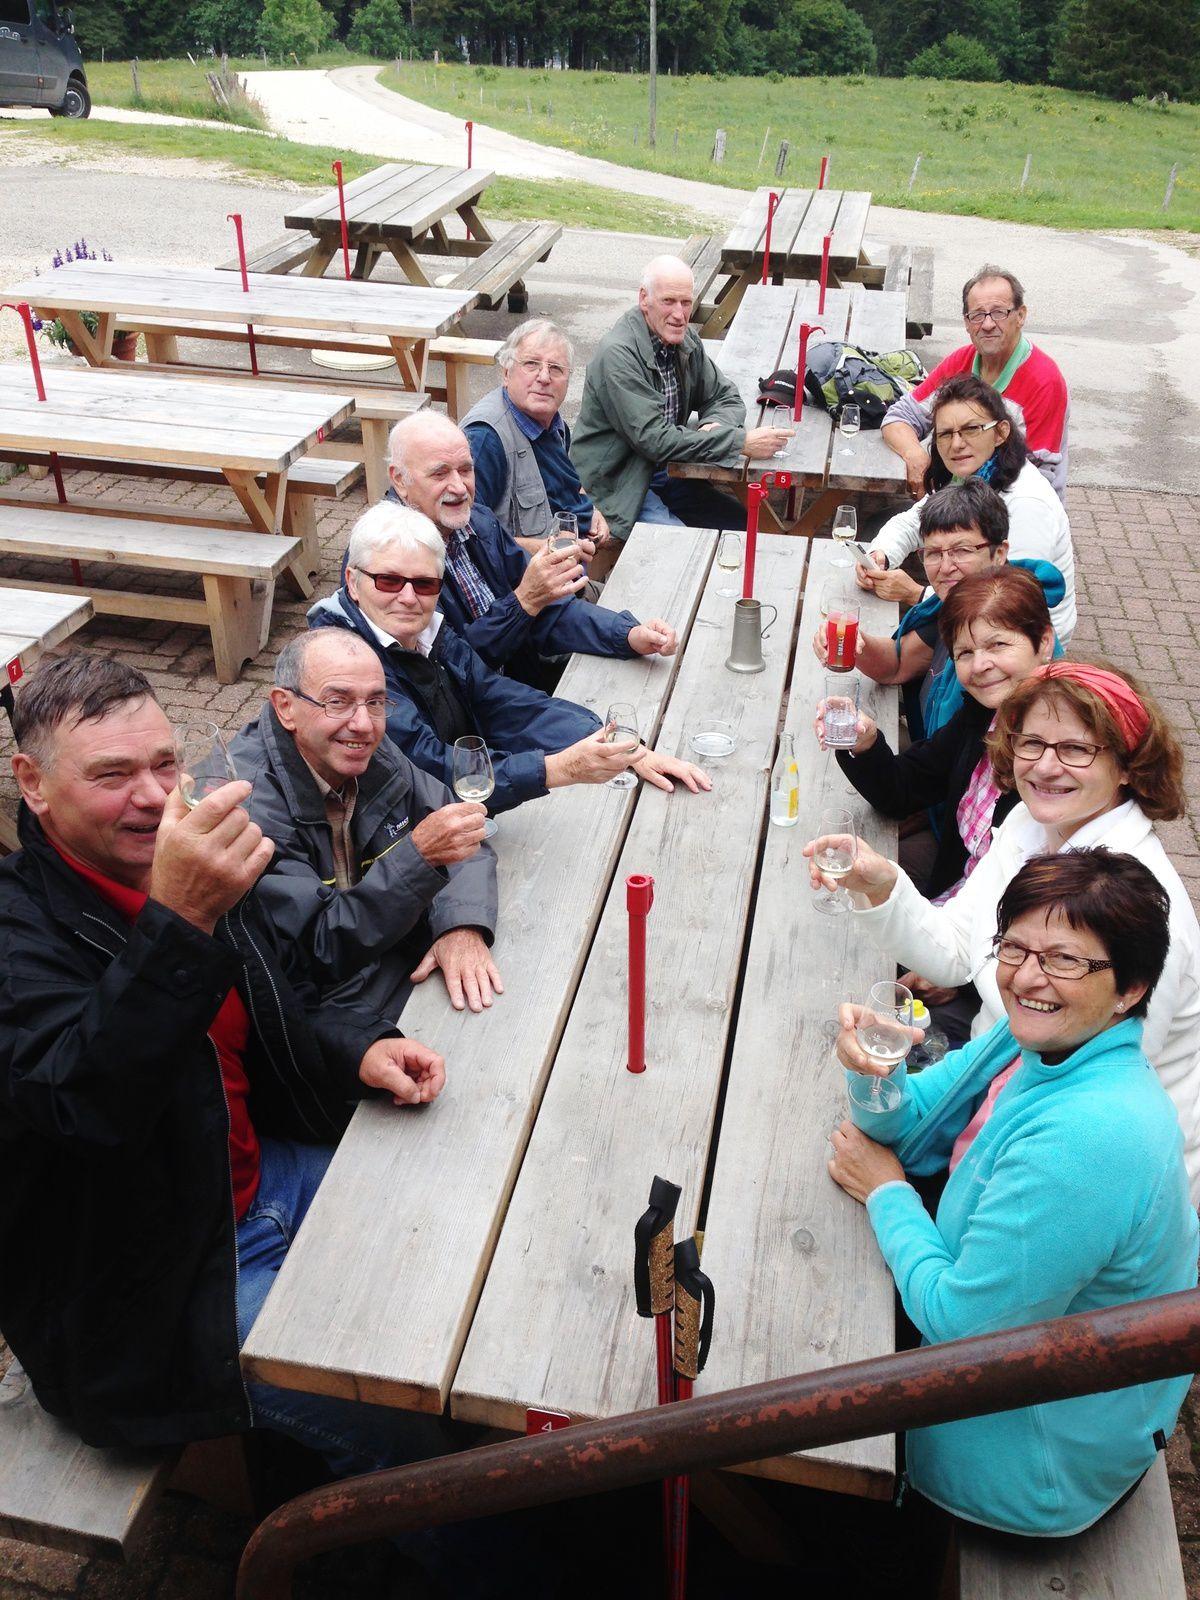 Mardi 16 juin: Les Aiguilles de Baulmes